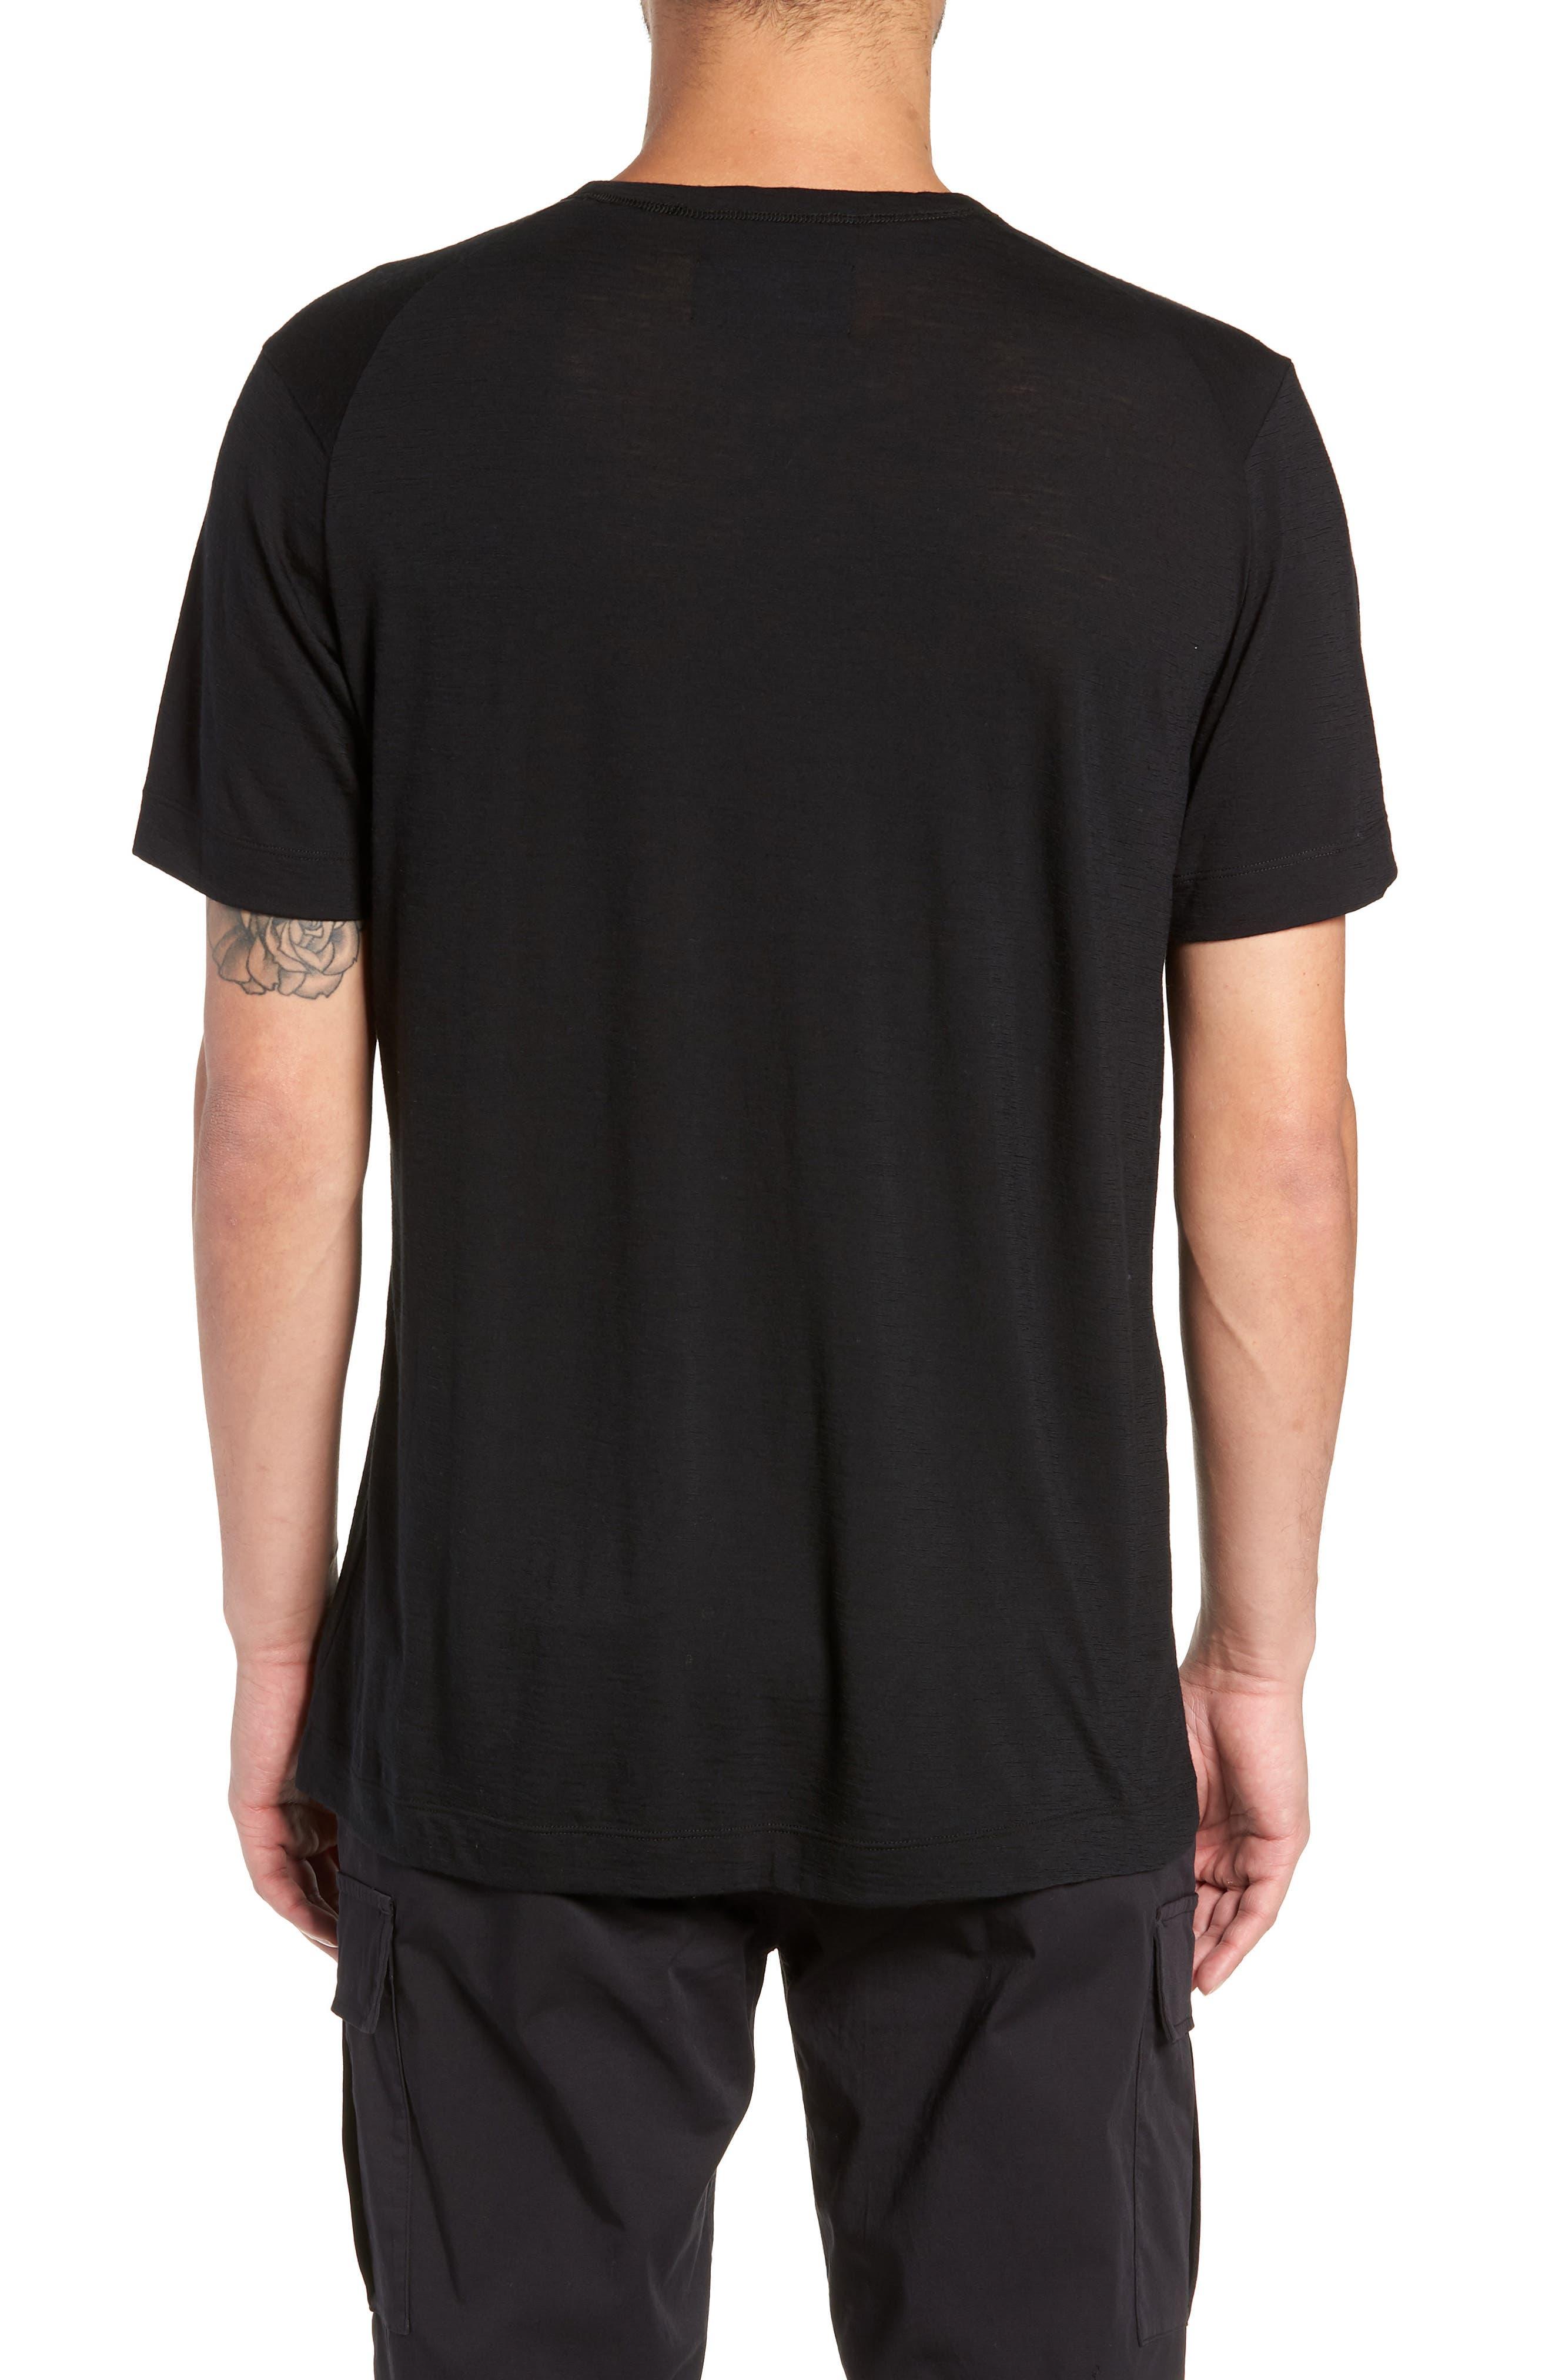 Swedish Merino Wool T-Shirt,                             Alternate thumbnail 2, color,                             BLACK